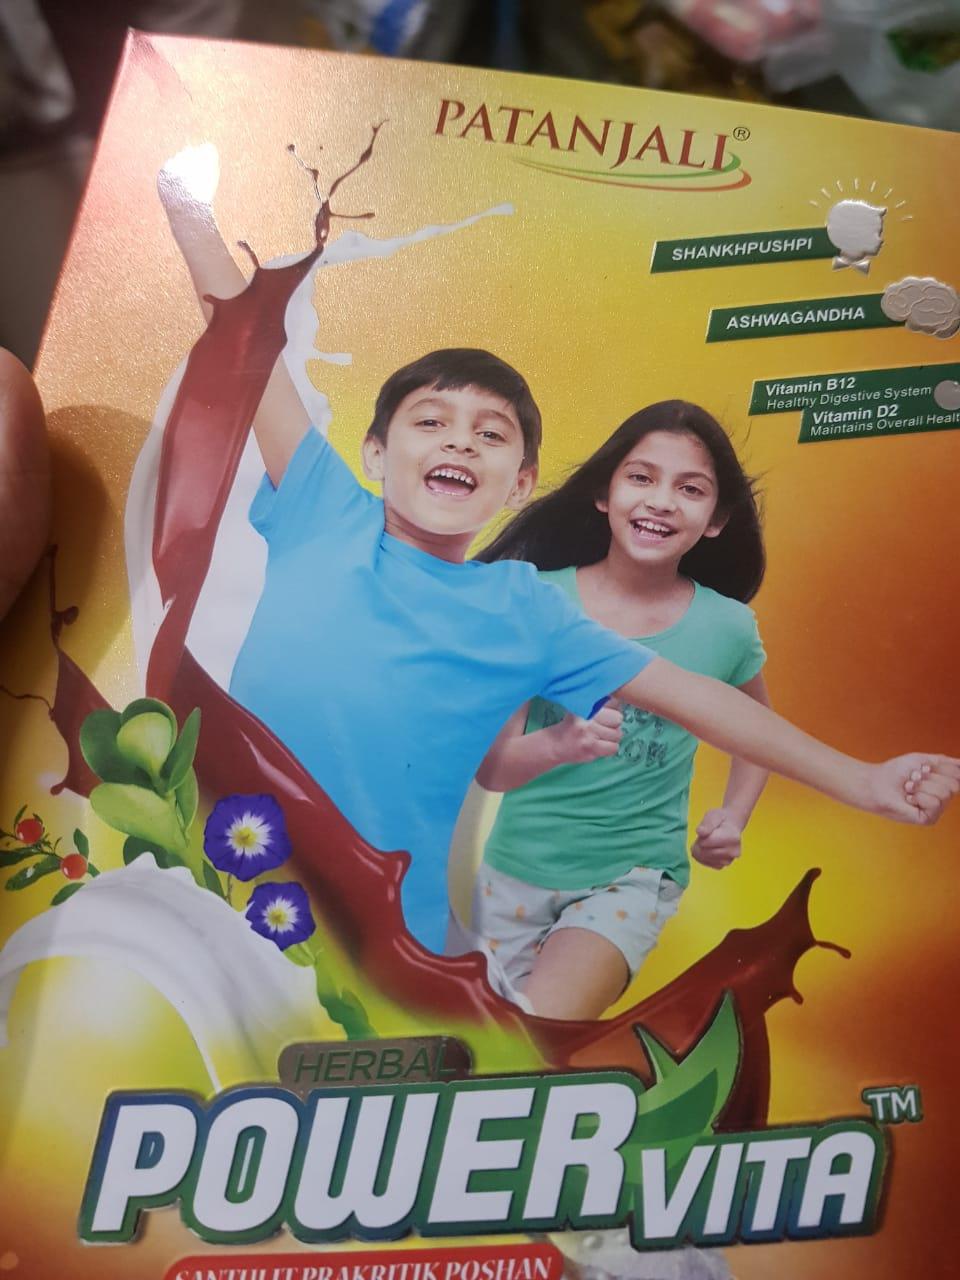 Patanjali Power Vita-Energy booster-By poonam_kakkar